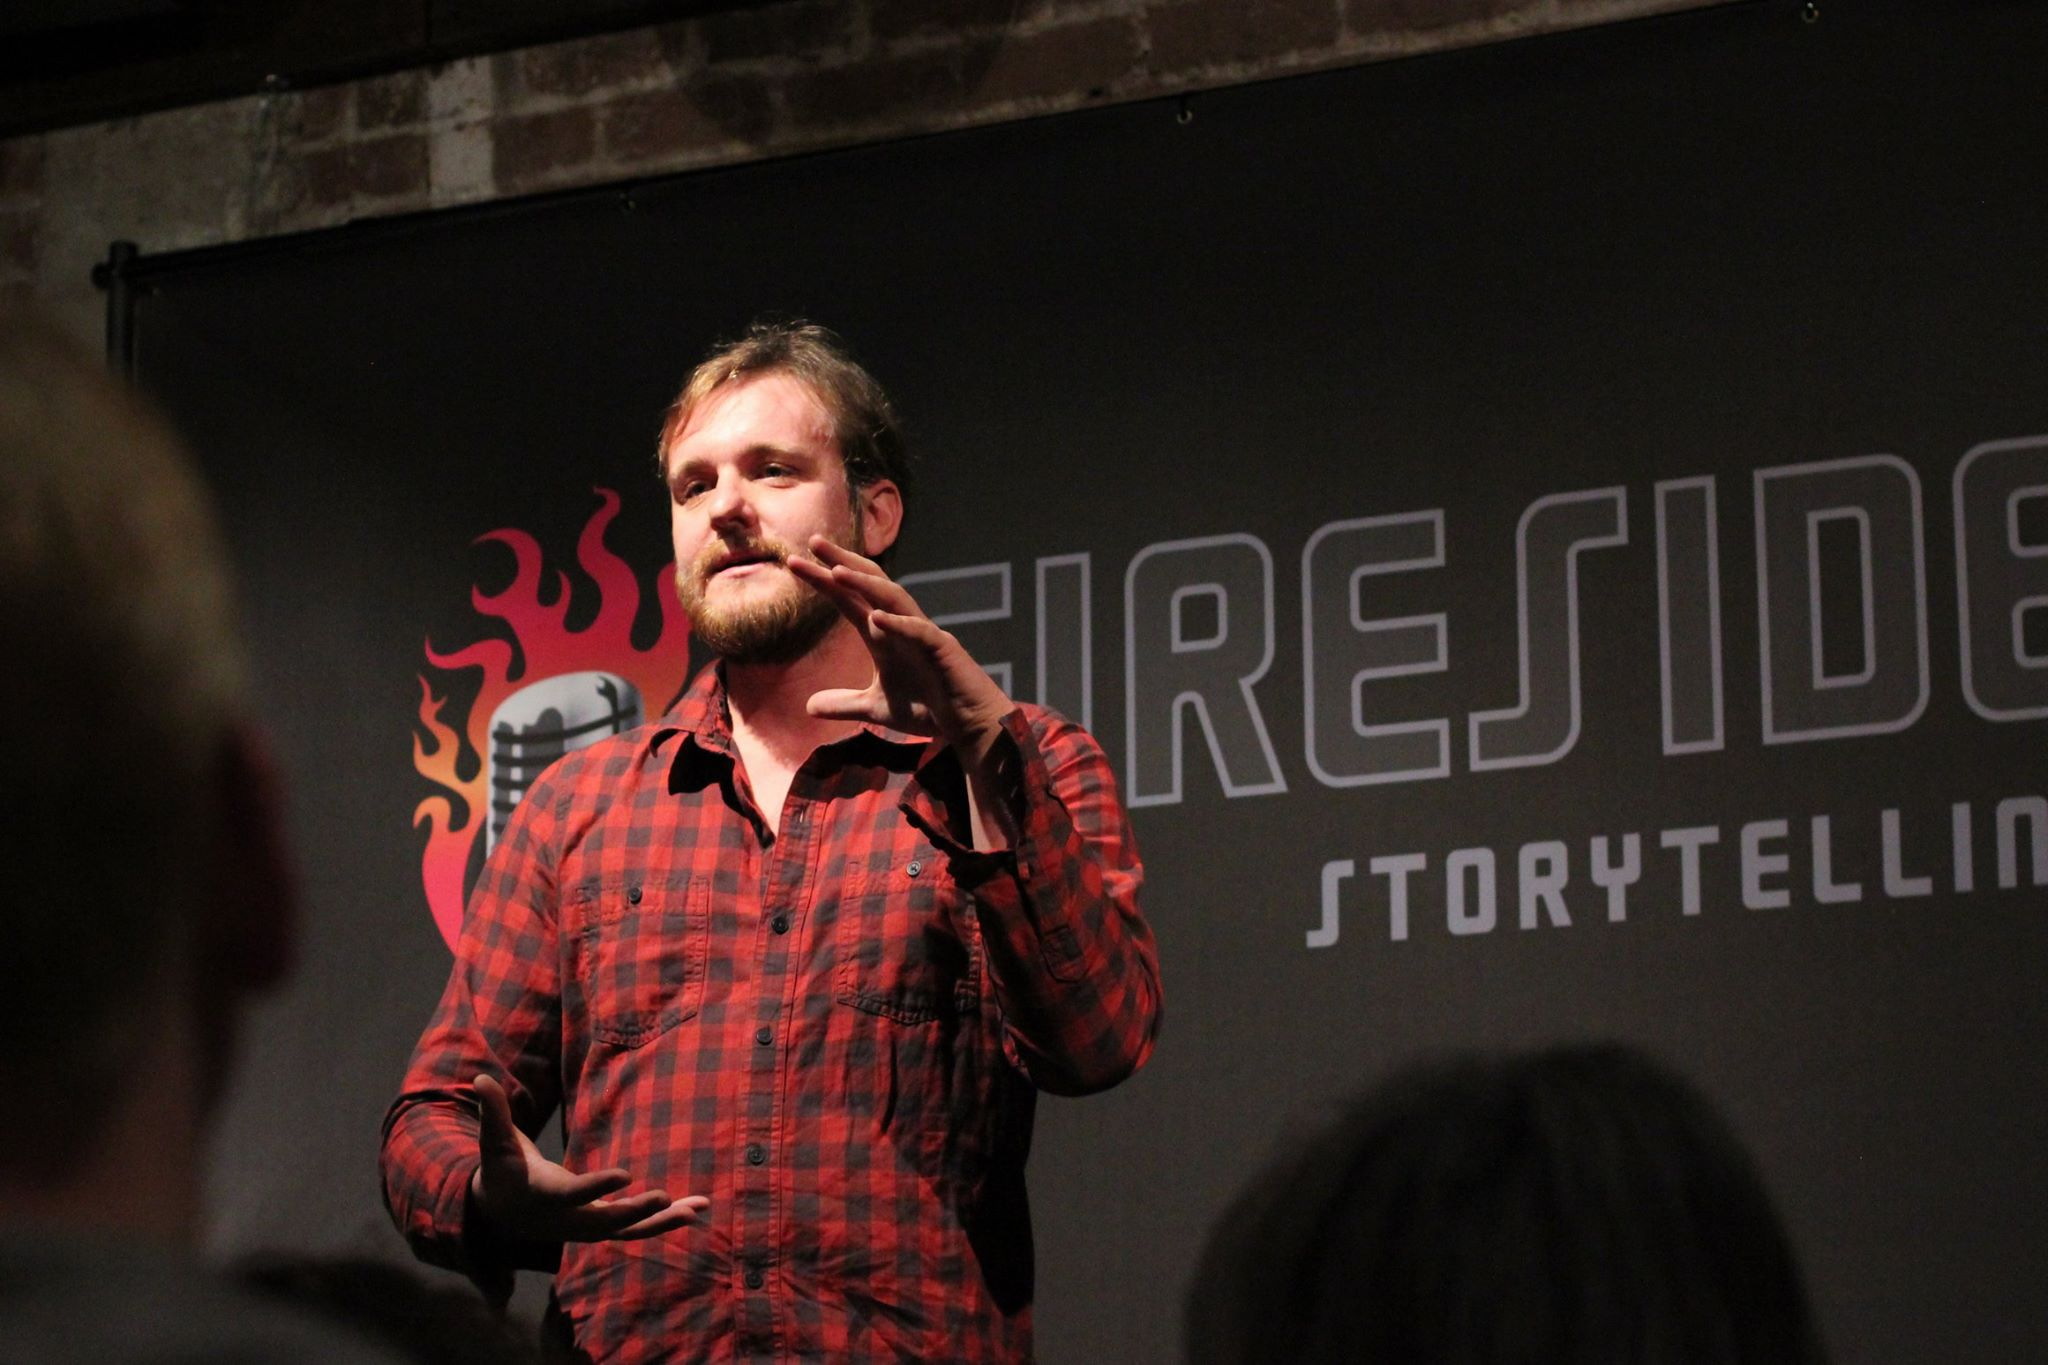 Performing at Fireside Storytelling in 2017